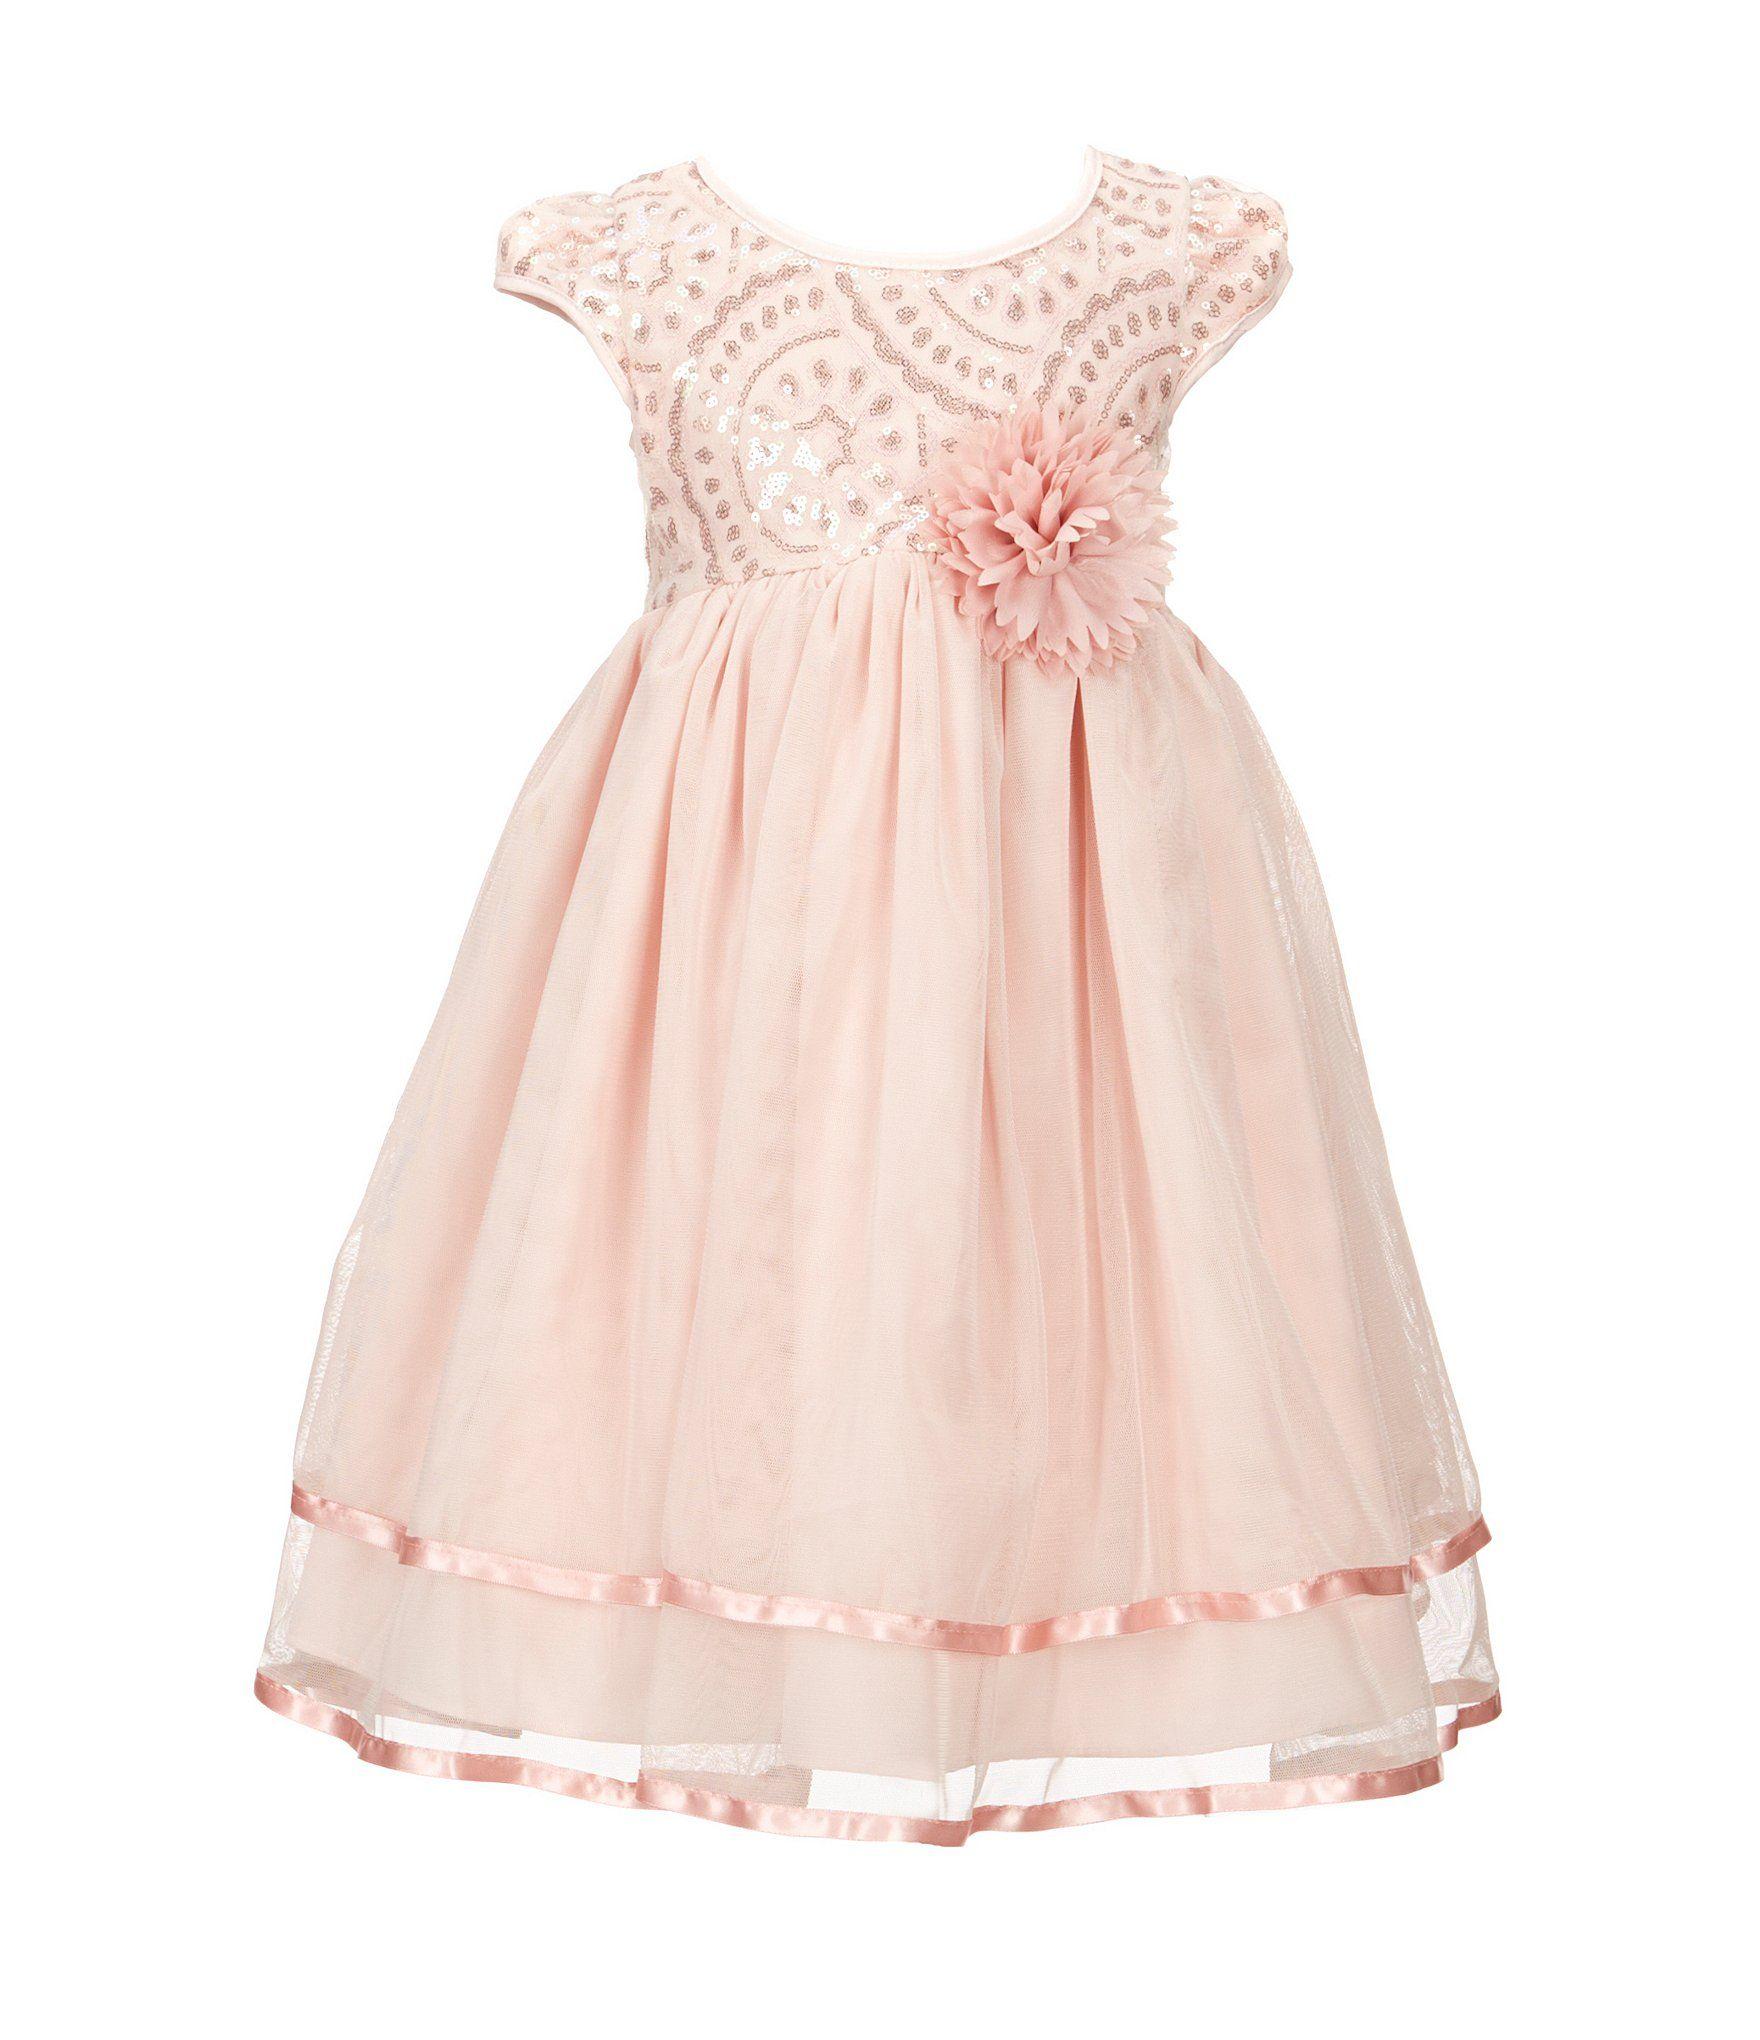 eb8d5ed48ae5 Marmellata Little Girls 2T6X Embellished Tulle Dress  Dillards ...